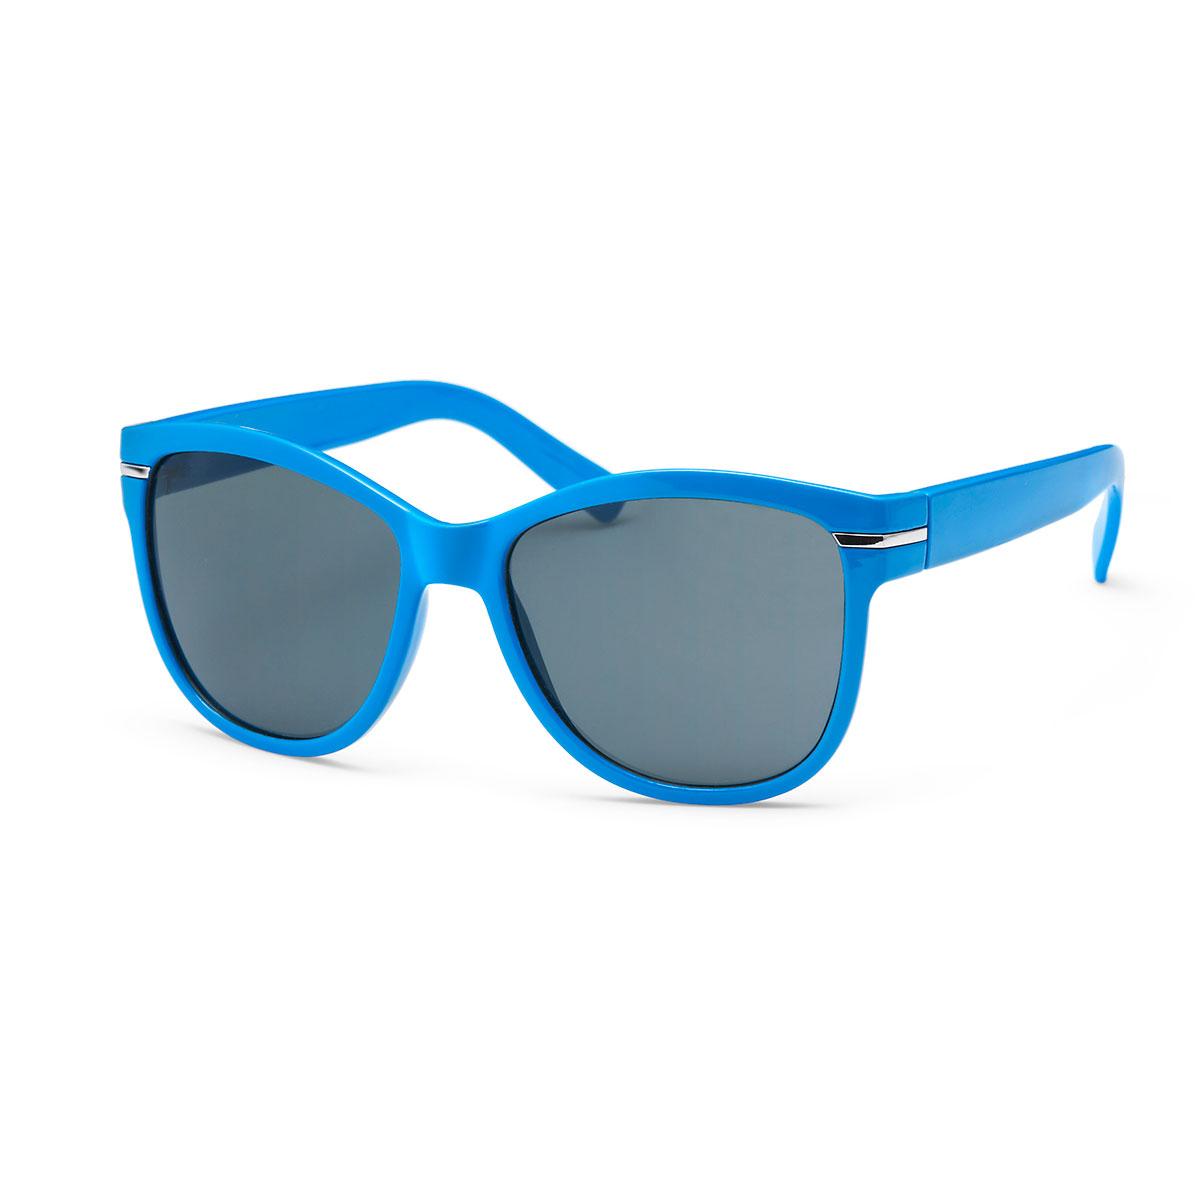 عینک آبی مدل فلوریدا